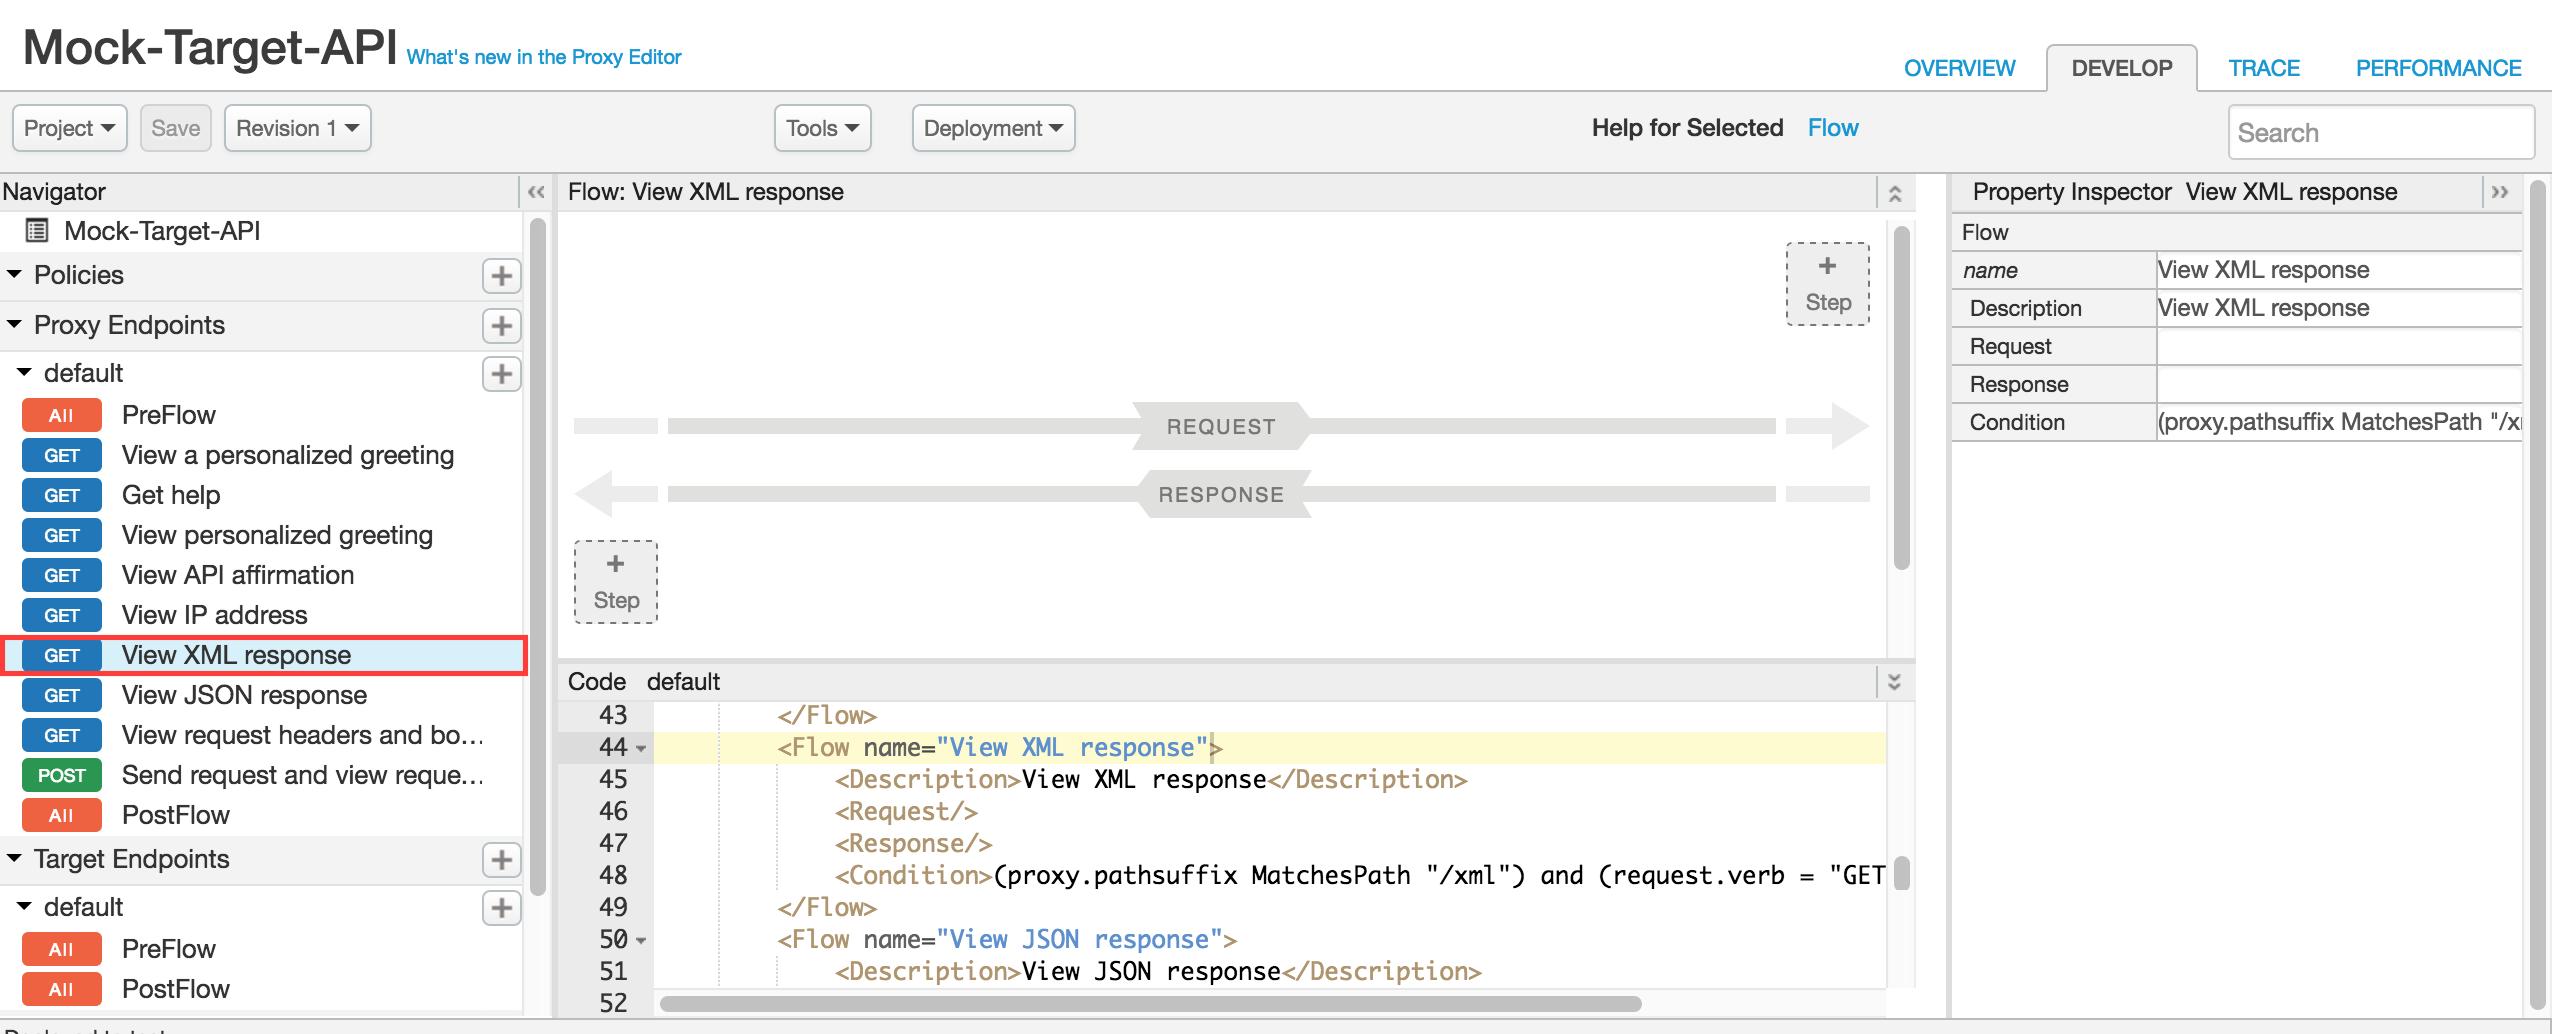 Select View XML Response